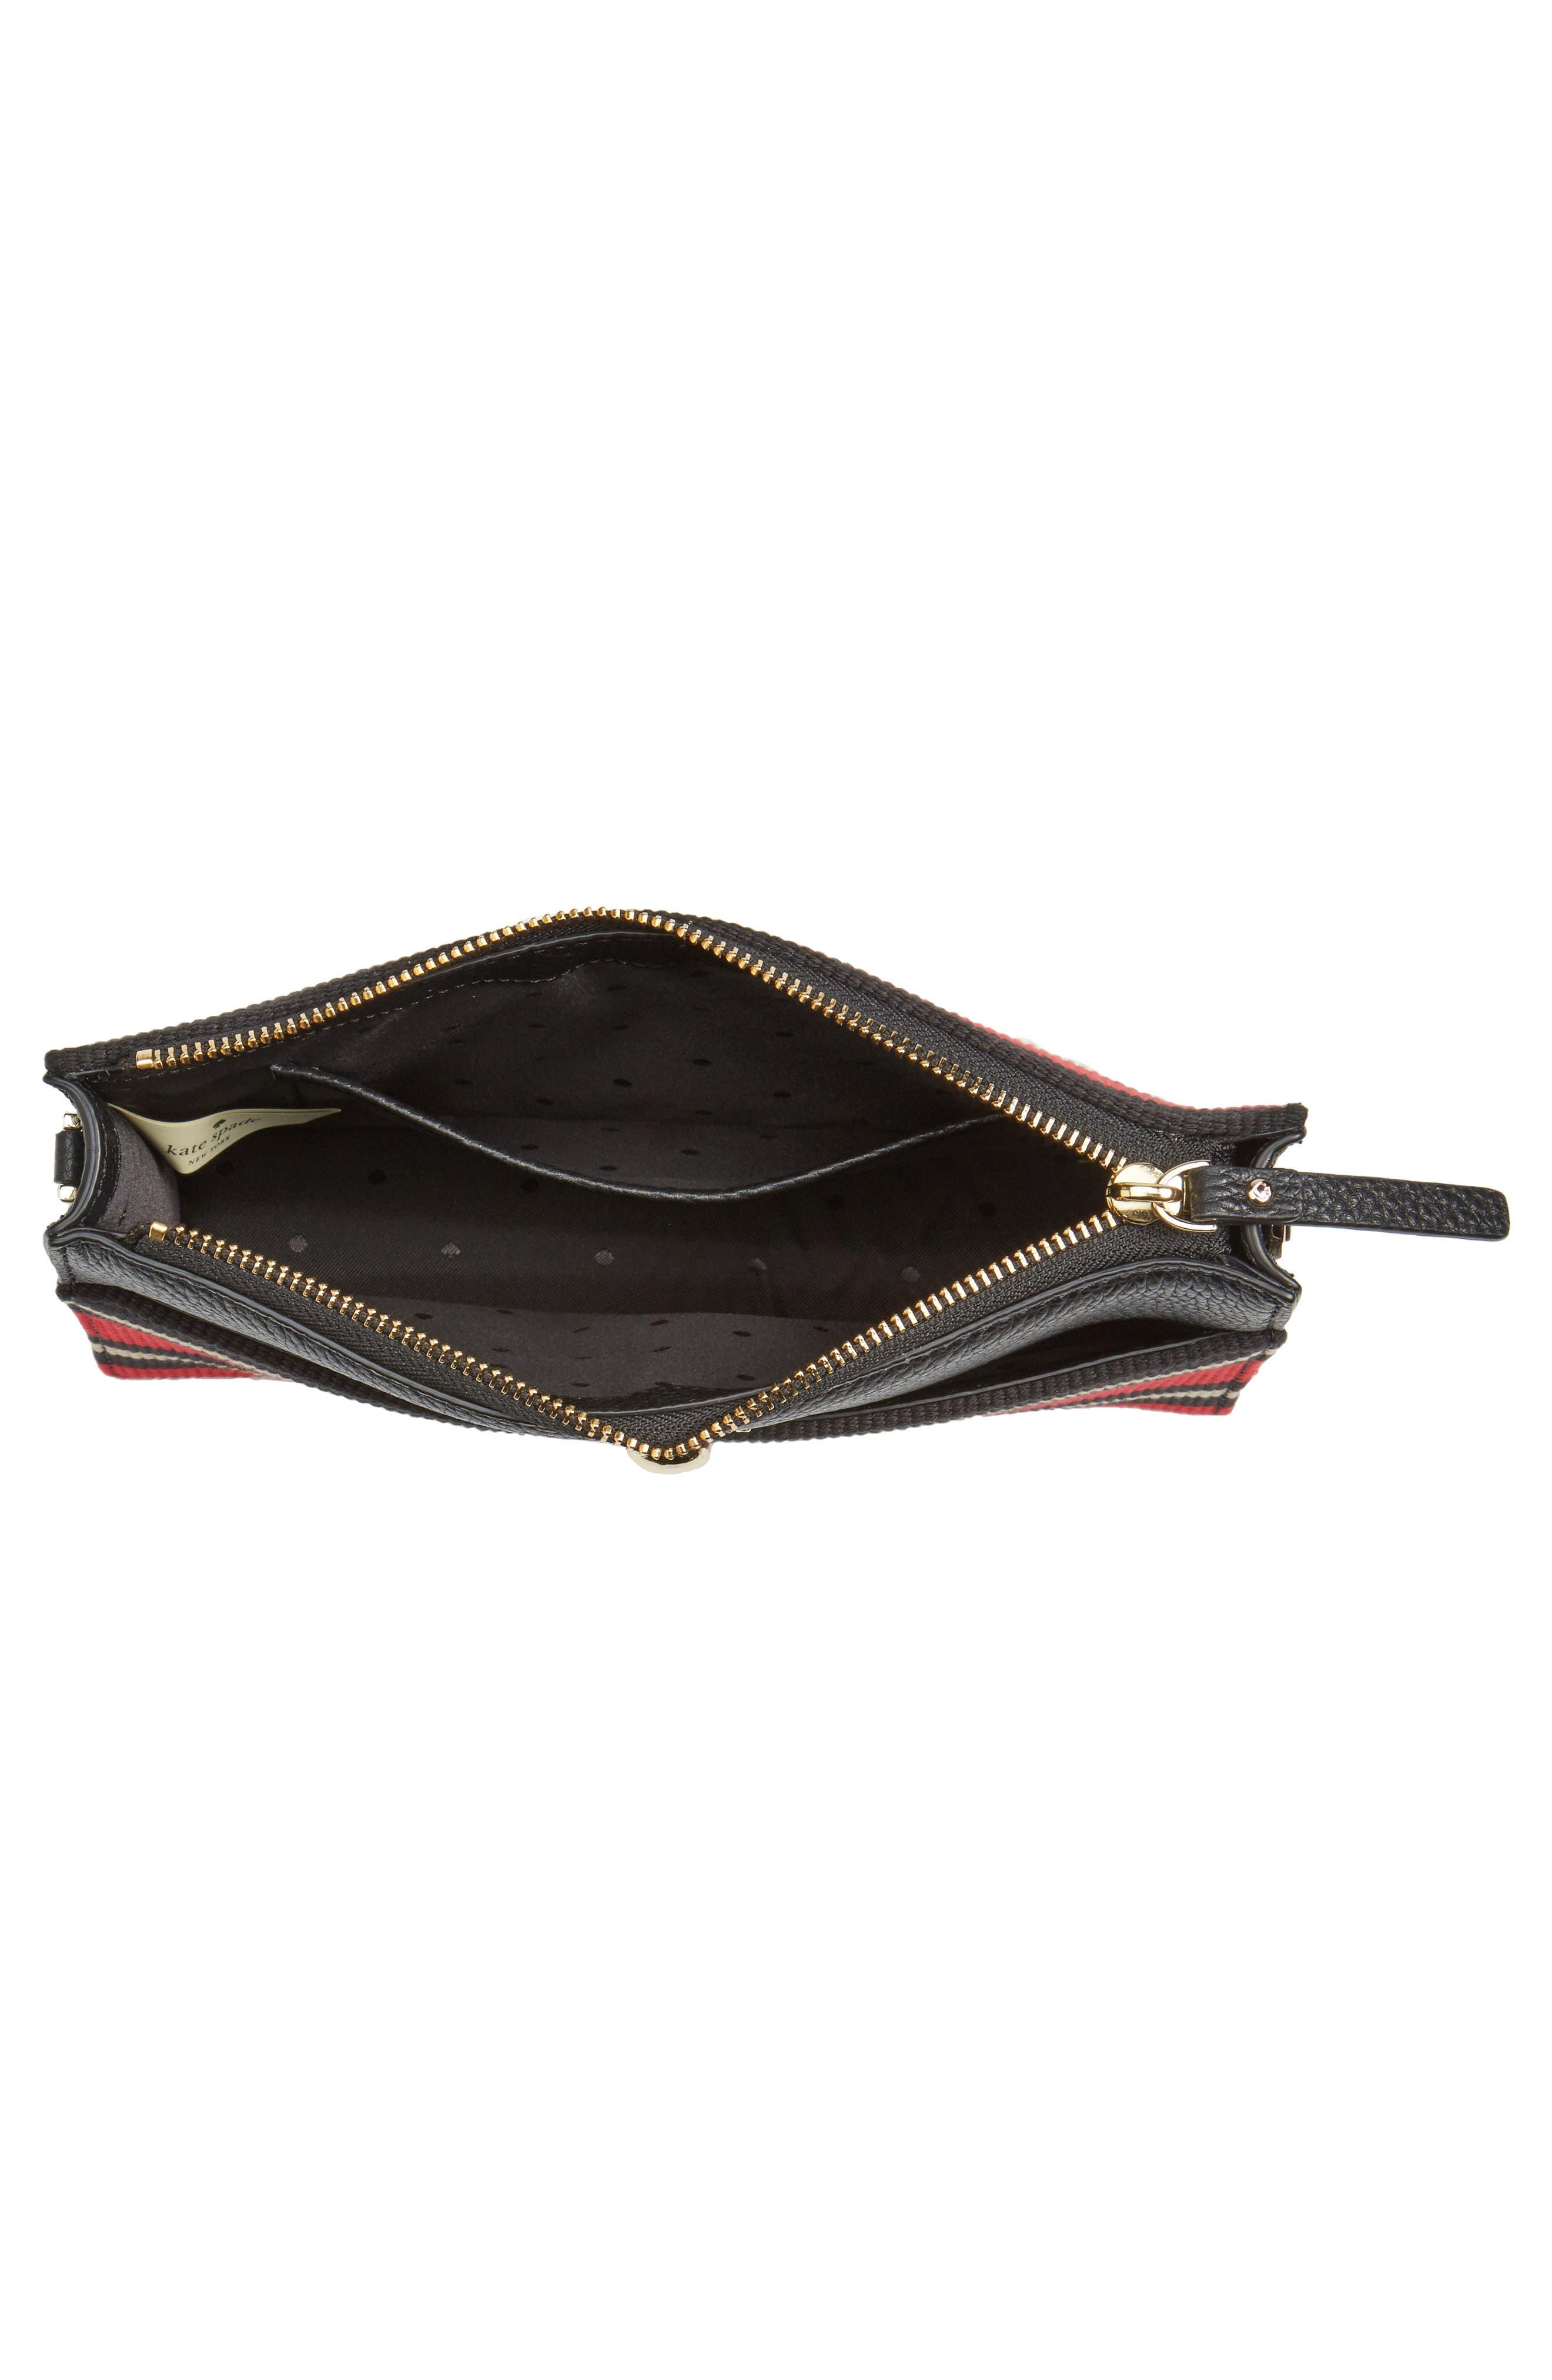 steward street clarise grosgrain stripe shoulder bag,                             Alternate thumbnail 4, color,                             600